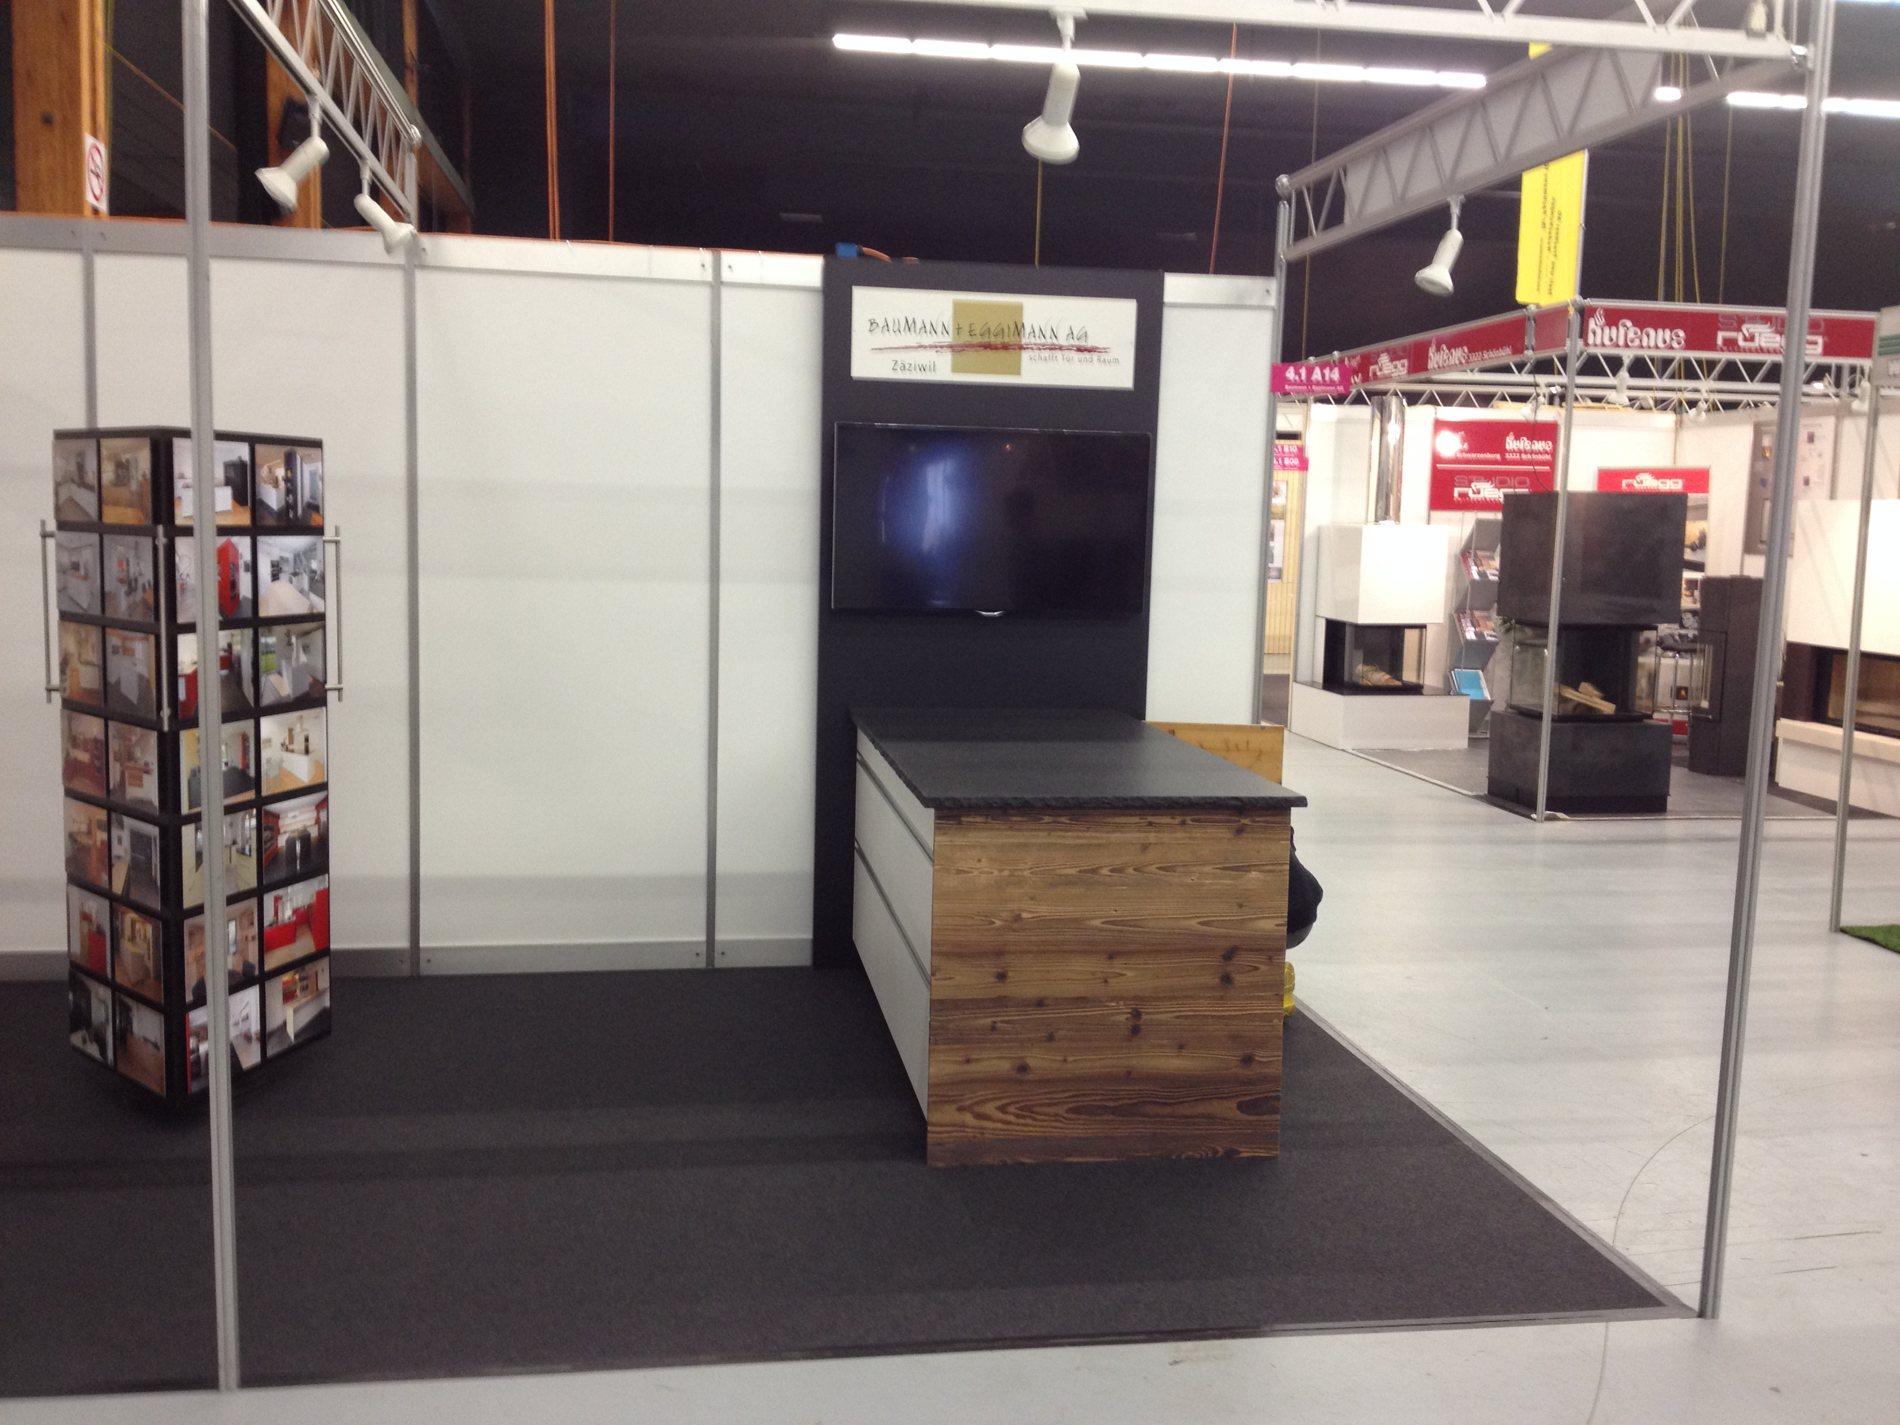 eigenheimmesse 2016 baumann eggimann ag. Black Bedroom Furniture Sets. Home Design Ideas